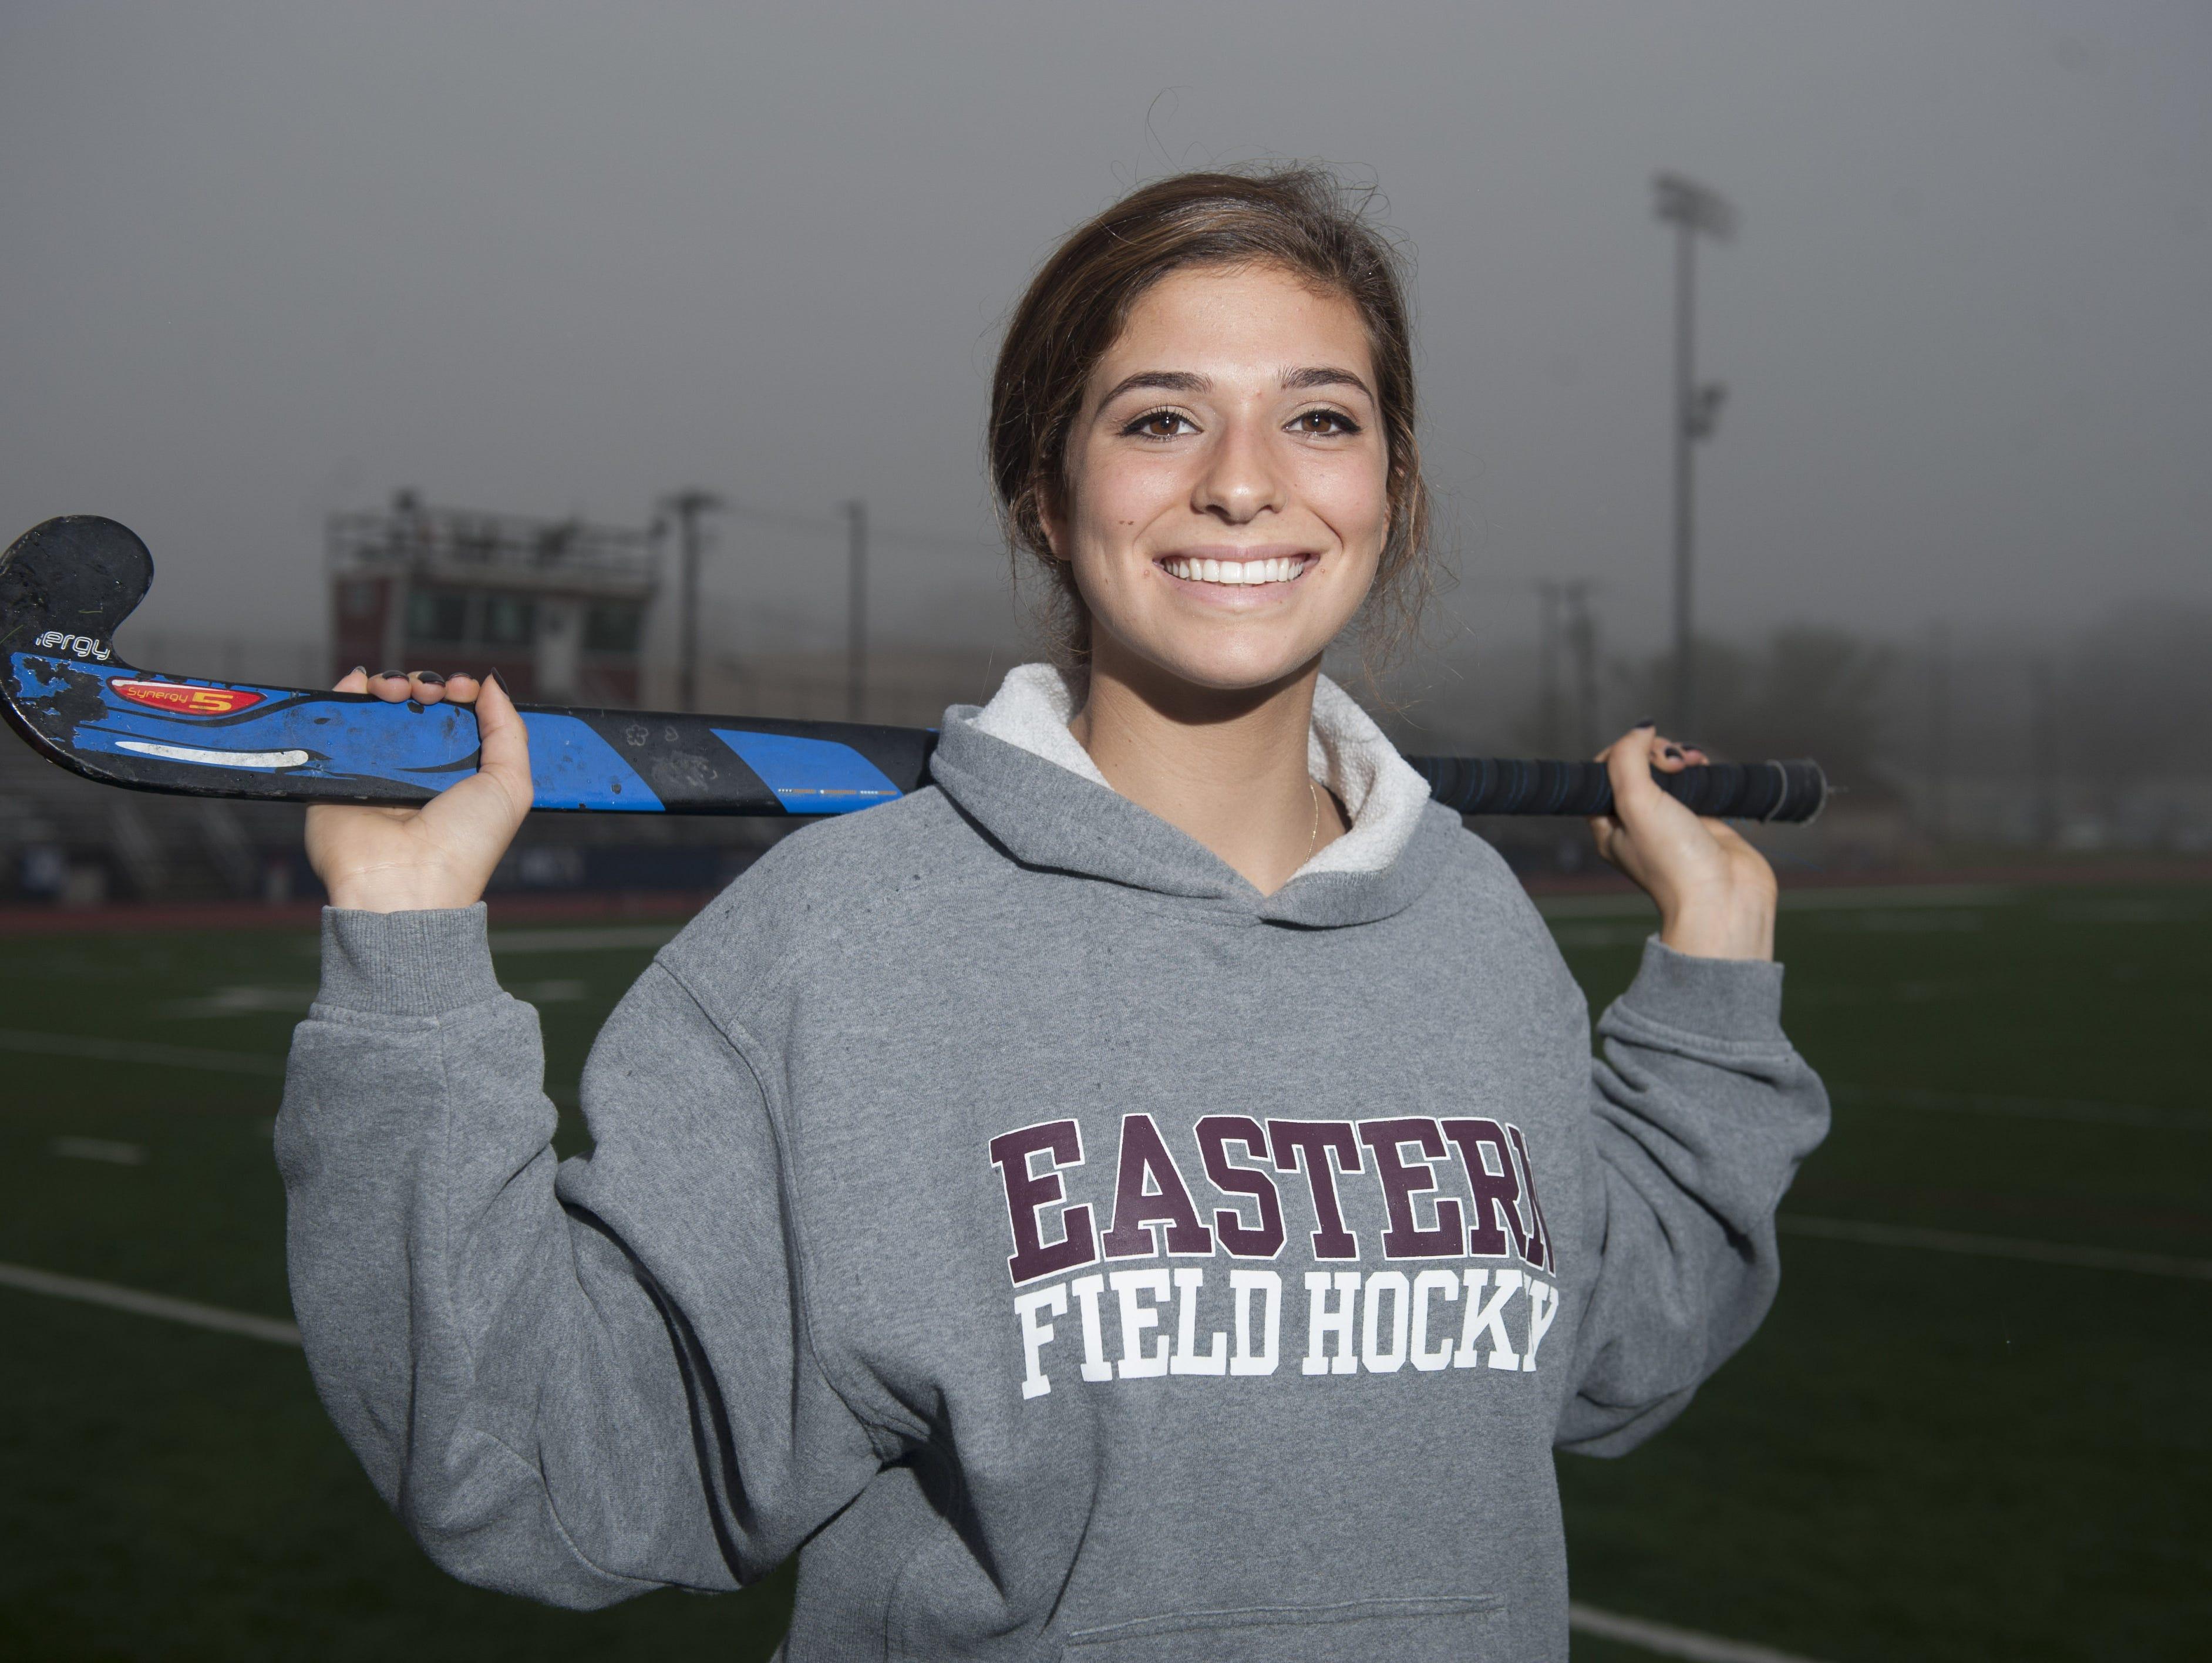 Field Hockey Player of the Year - Eastern'sr Madison Morano. Wednesday, December 2, 2015.